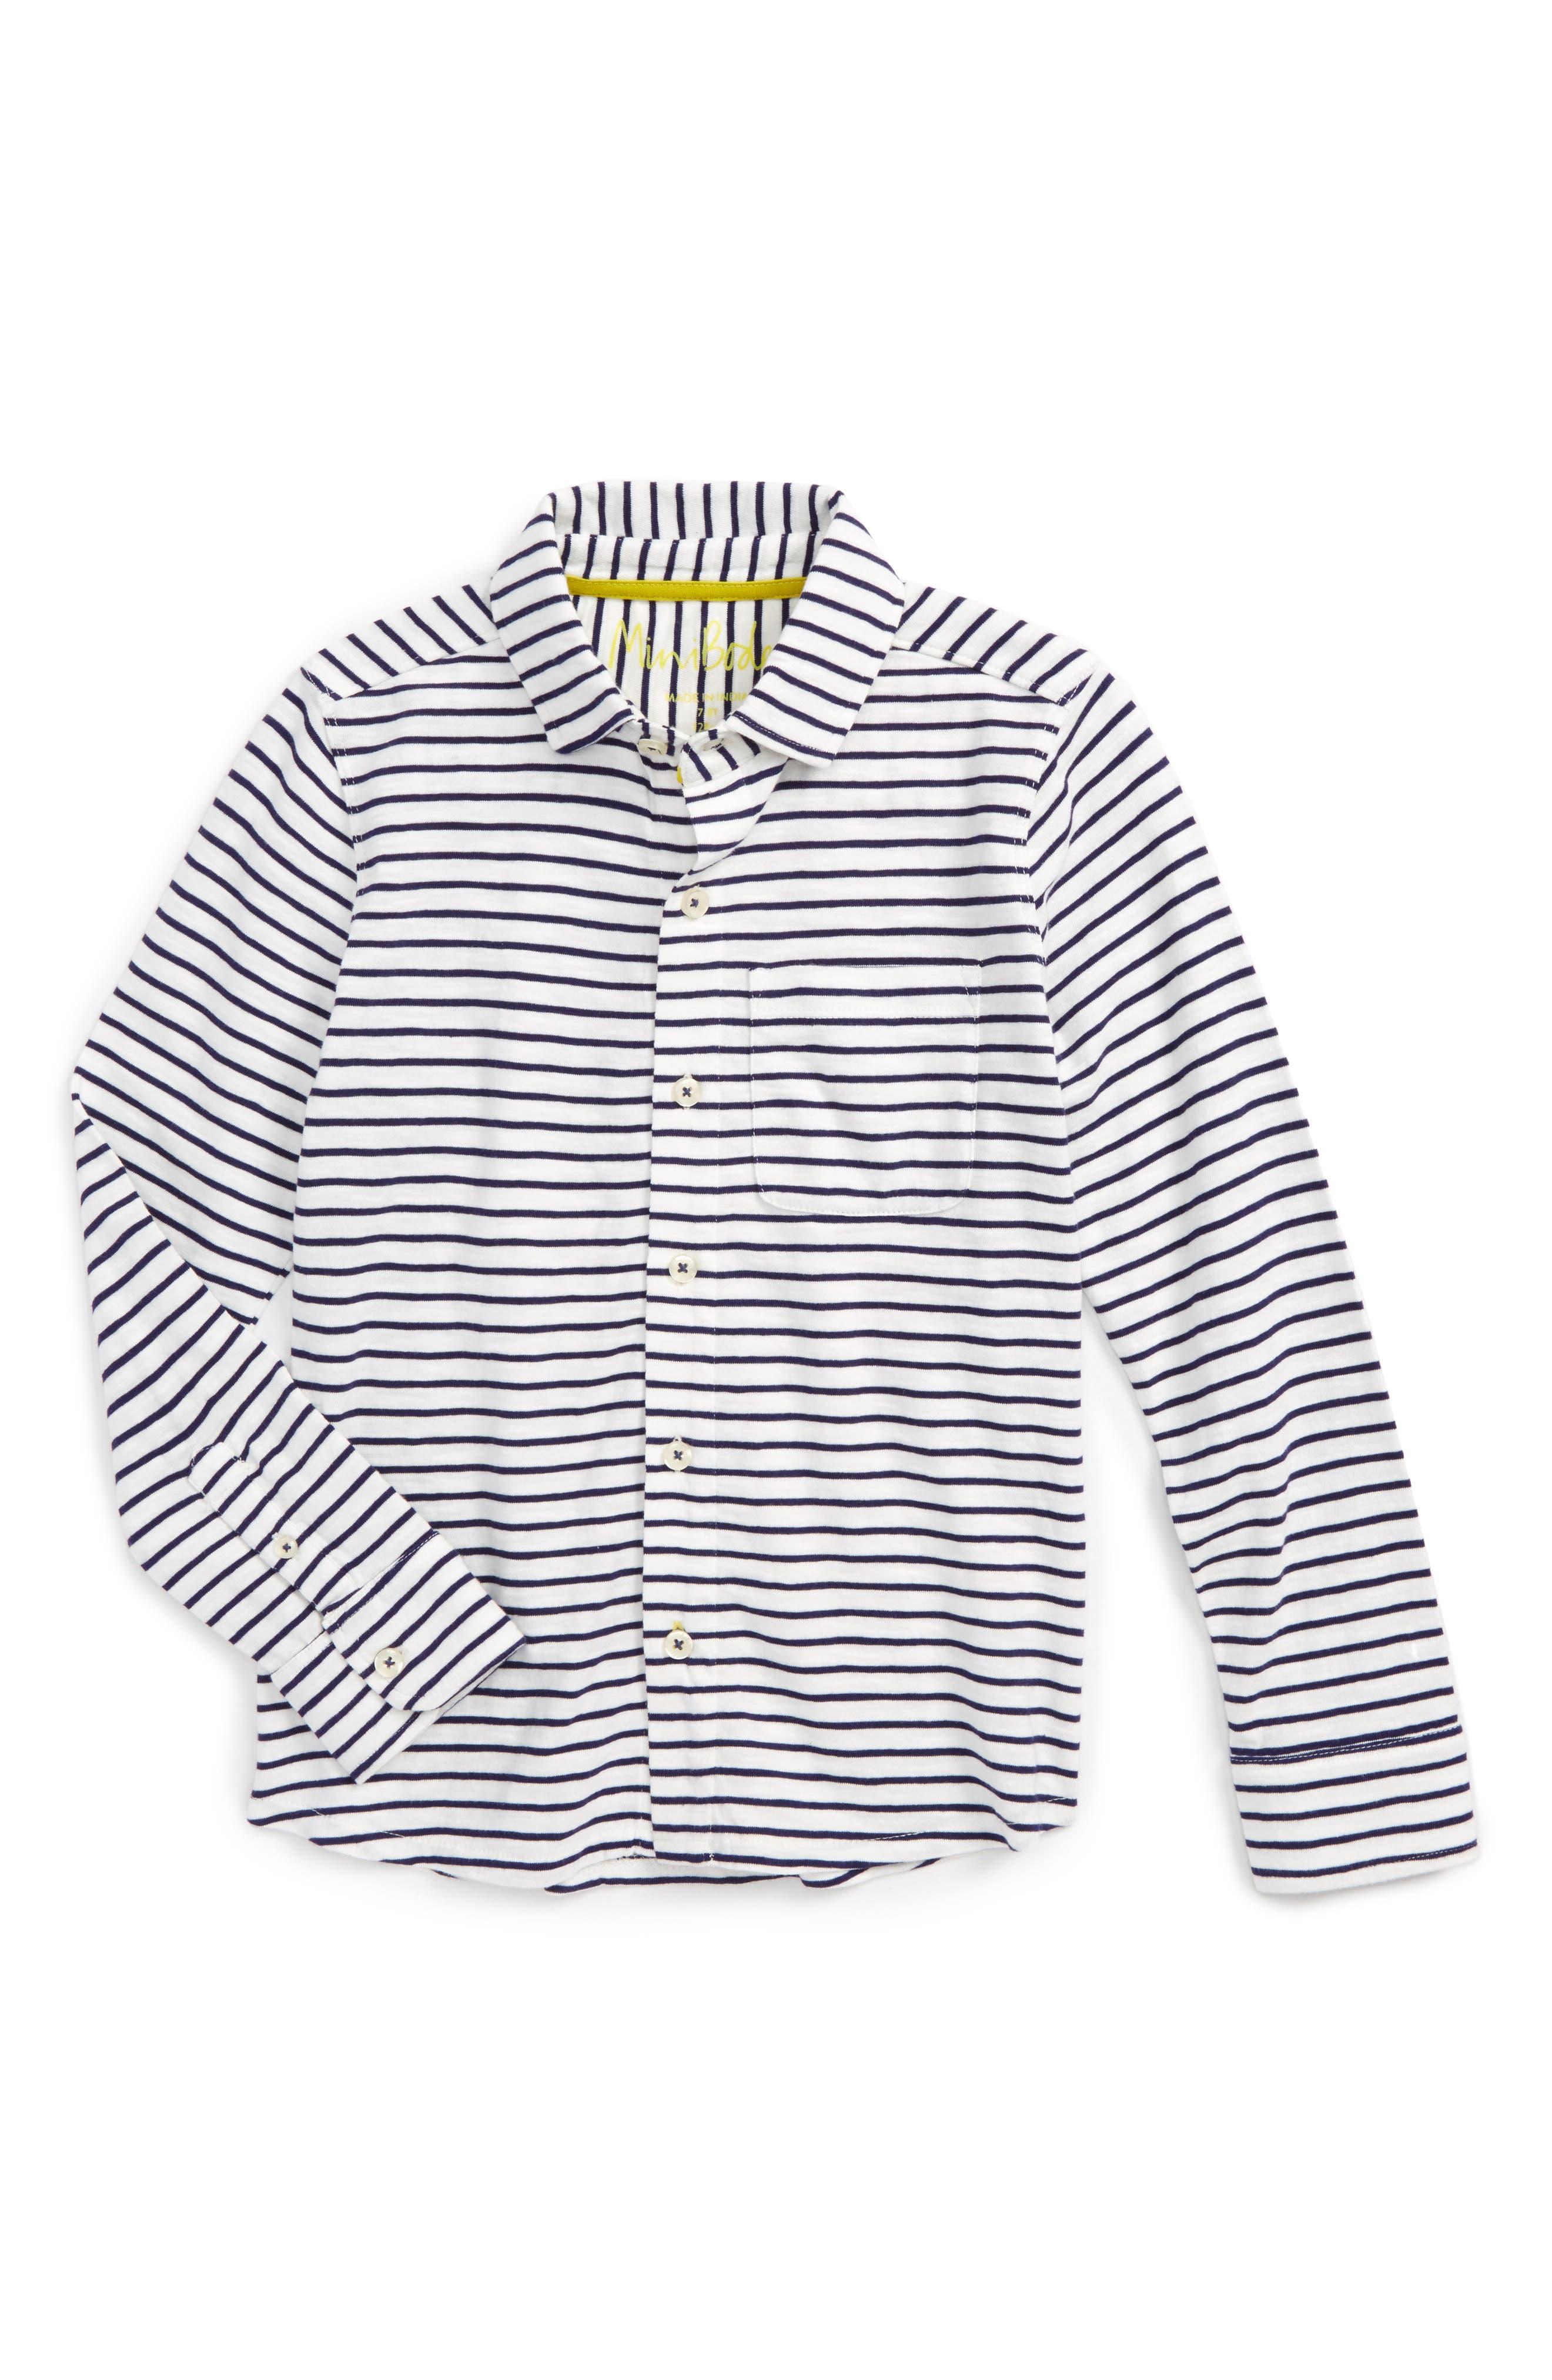 Stripe Jersey Shirt,                         Main,                         color, Ivory/ Workwear Blue